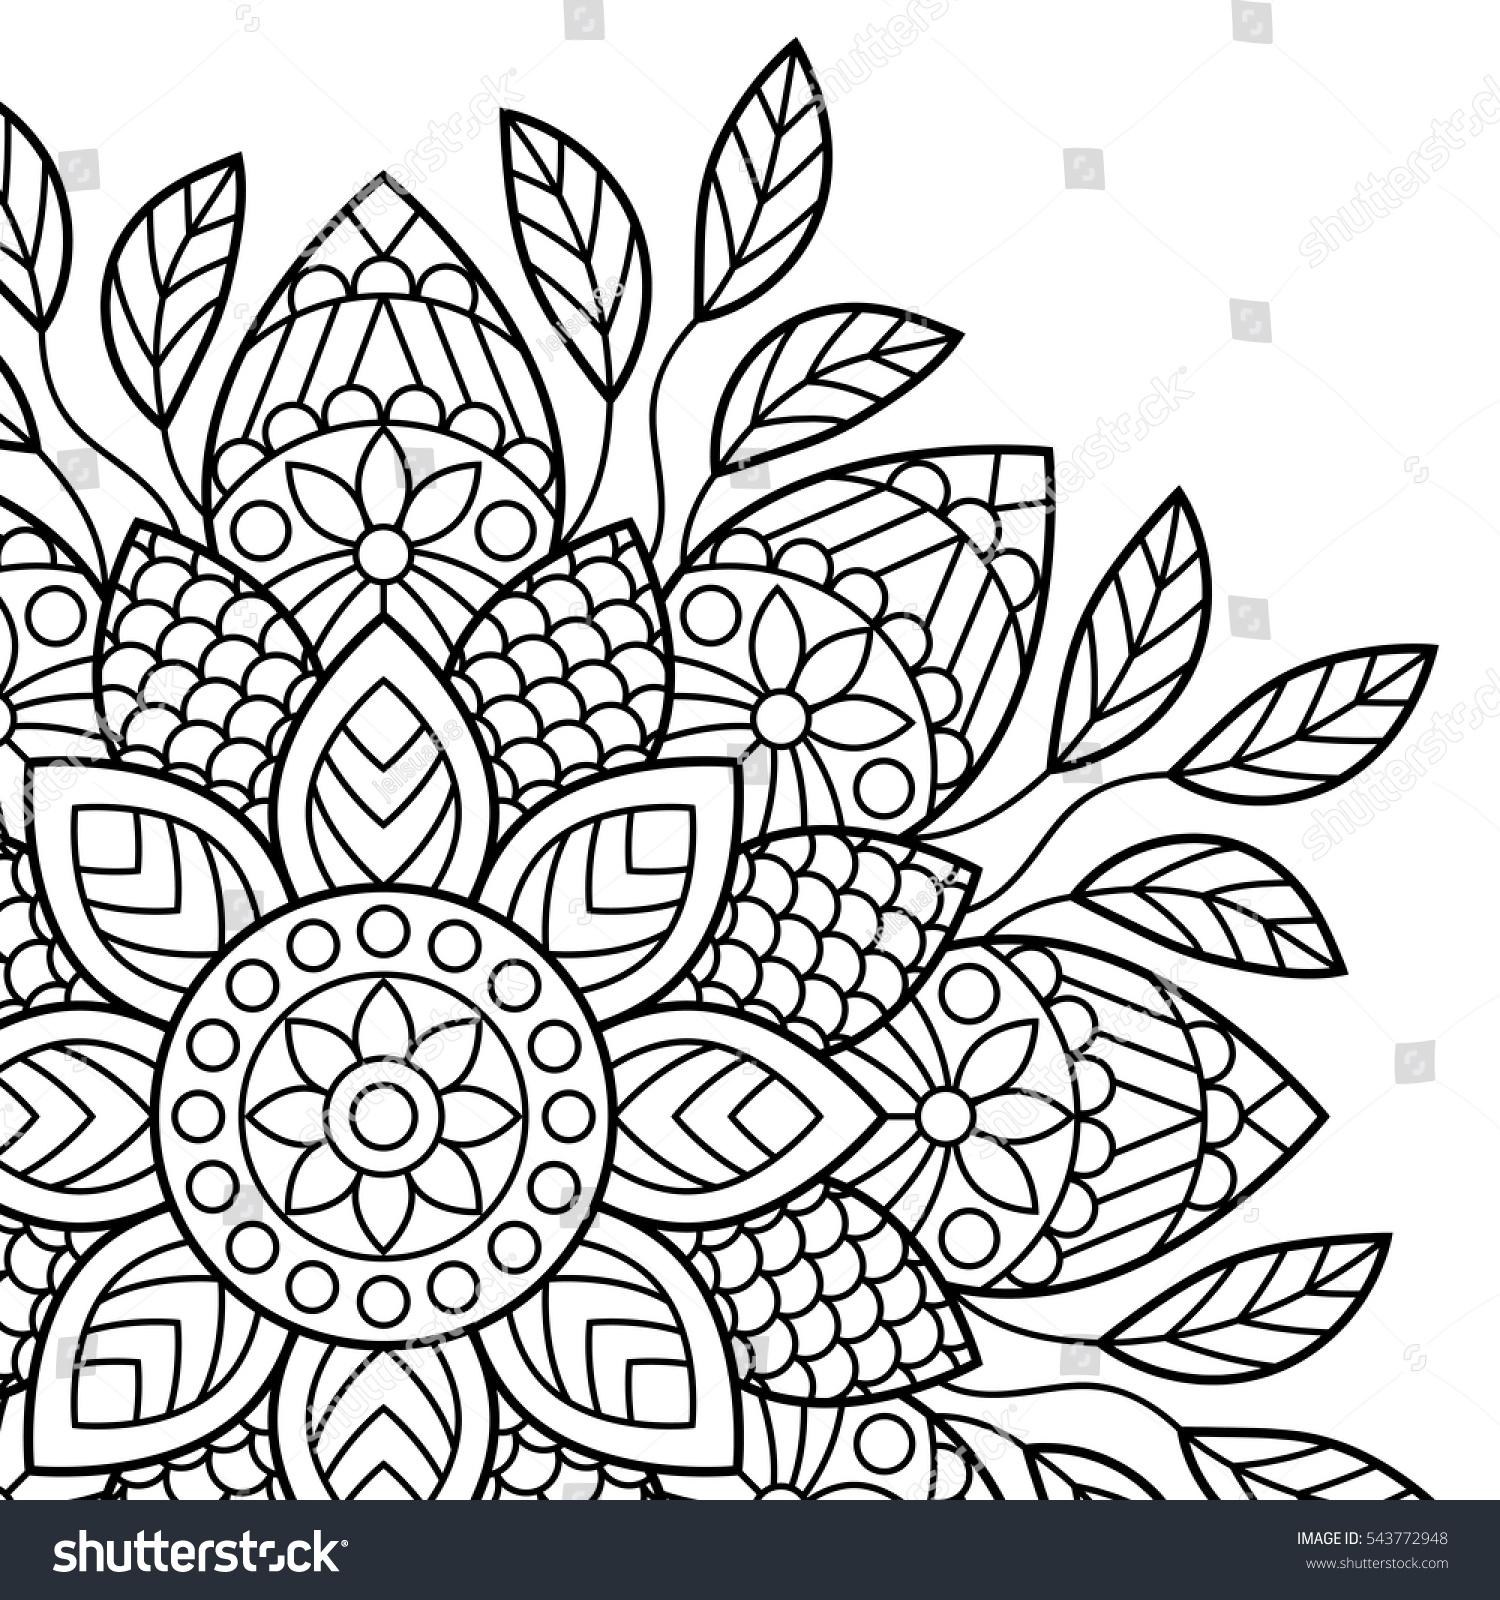 Mandala Coloring Book Pages Indian Antistress Stock Vector HD